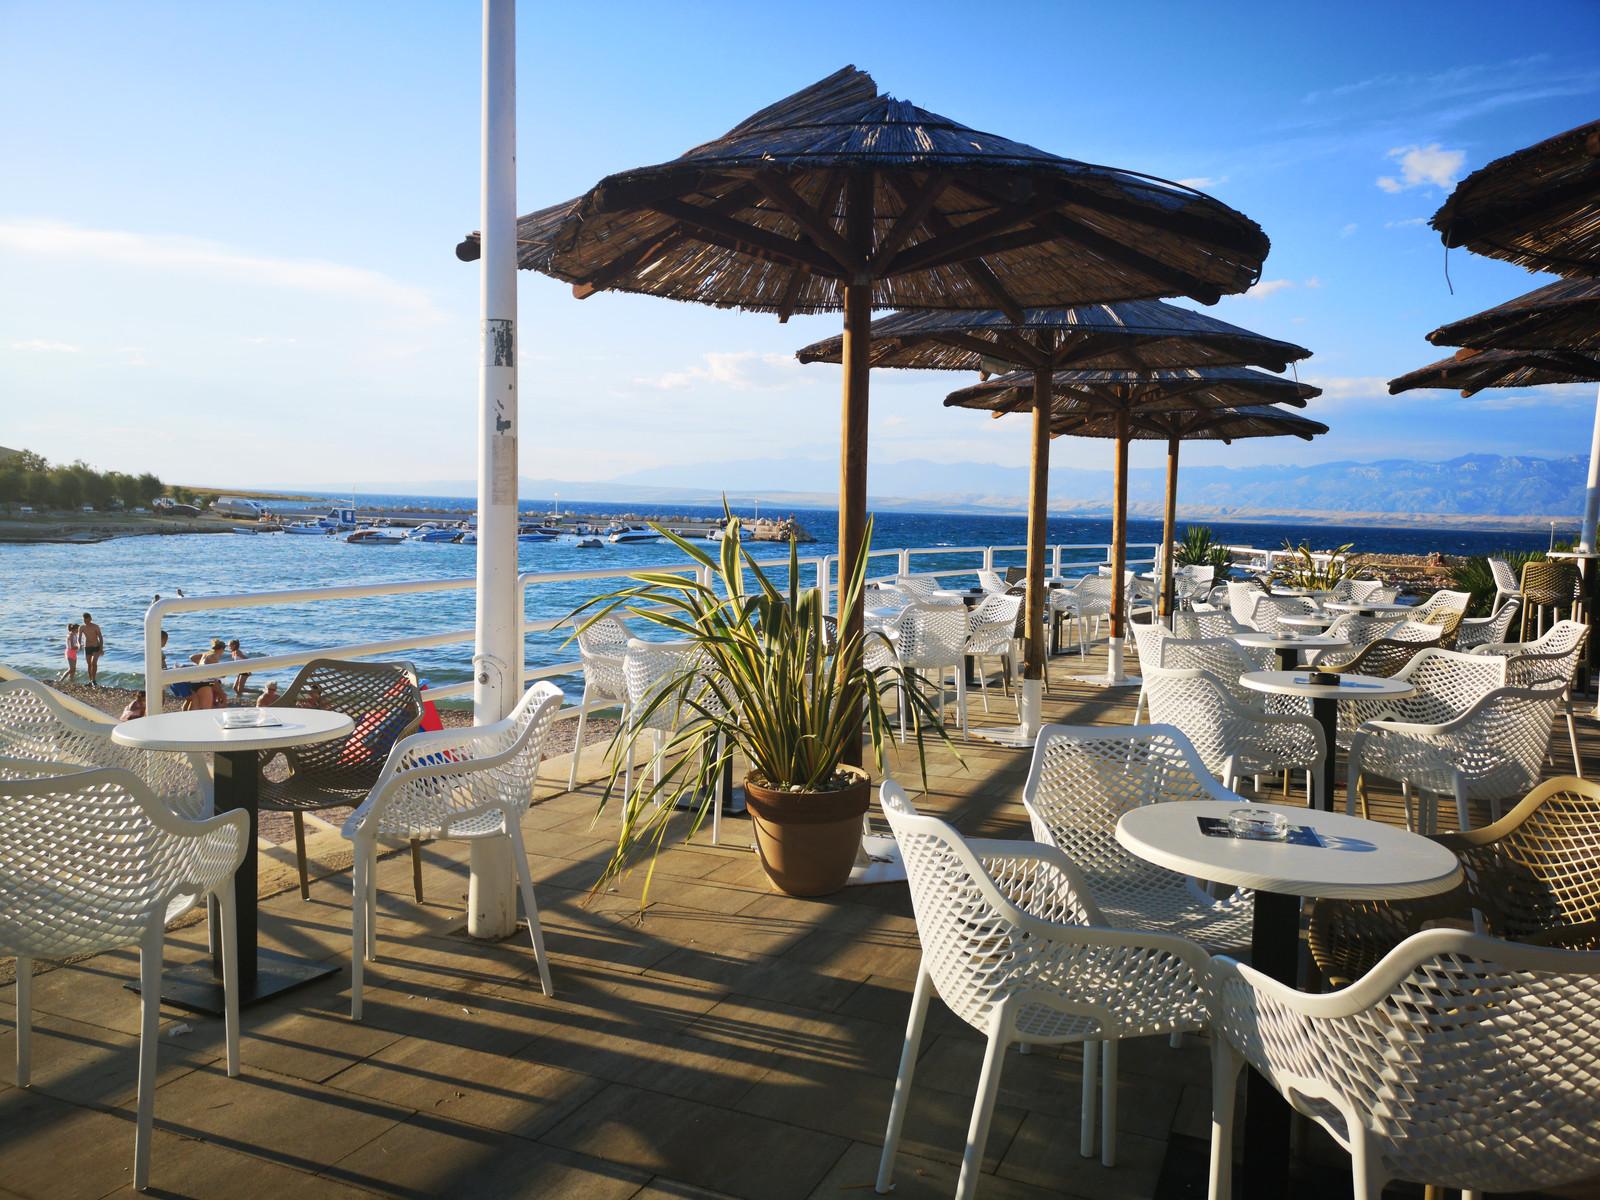 Beach Bar Marinero